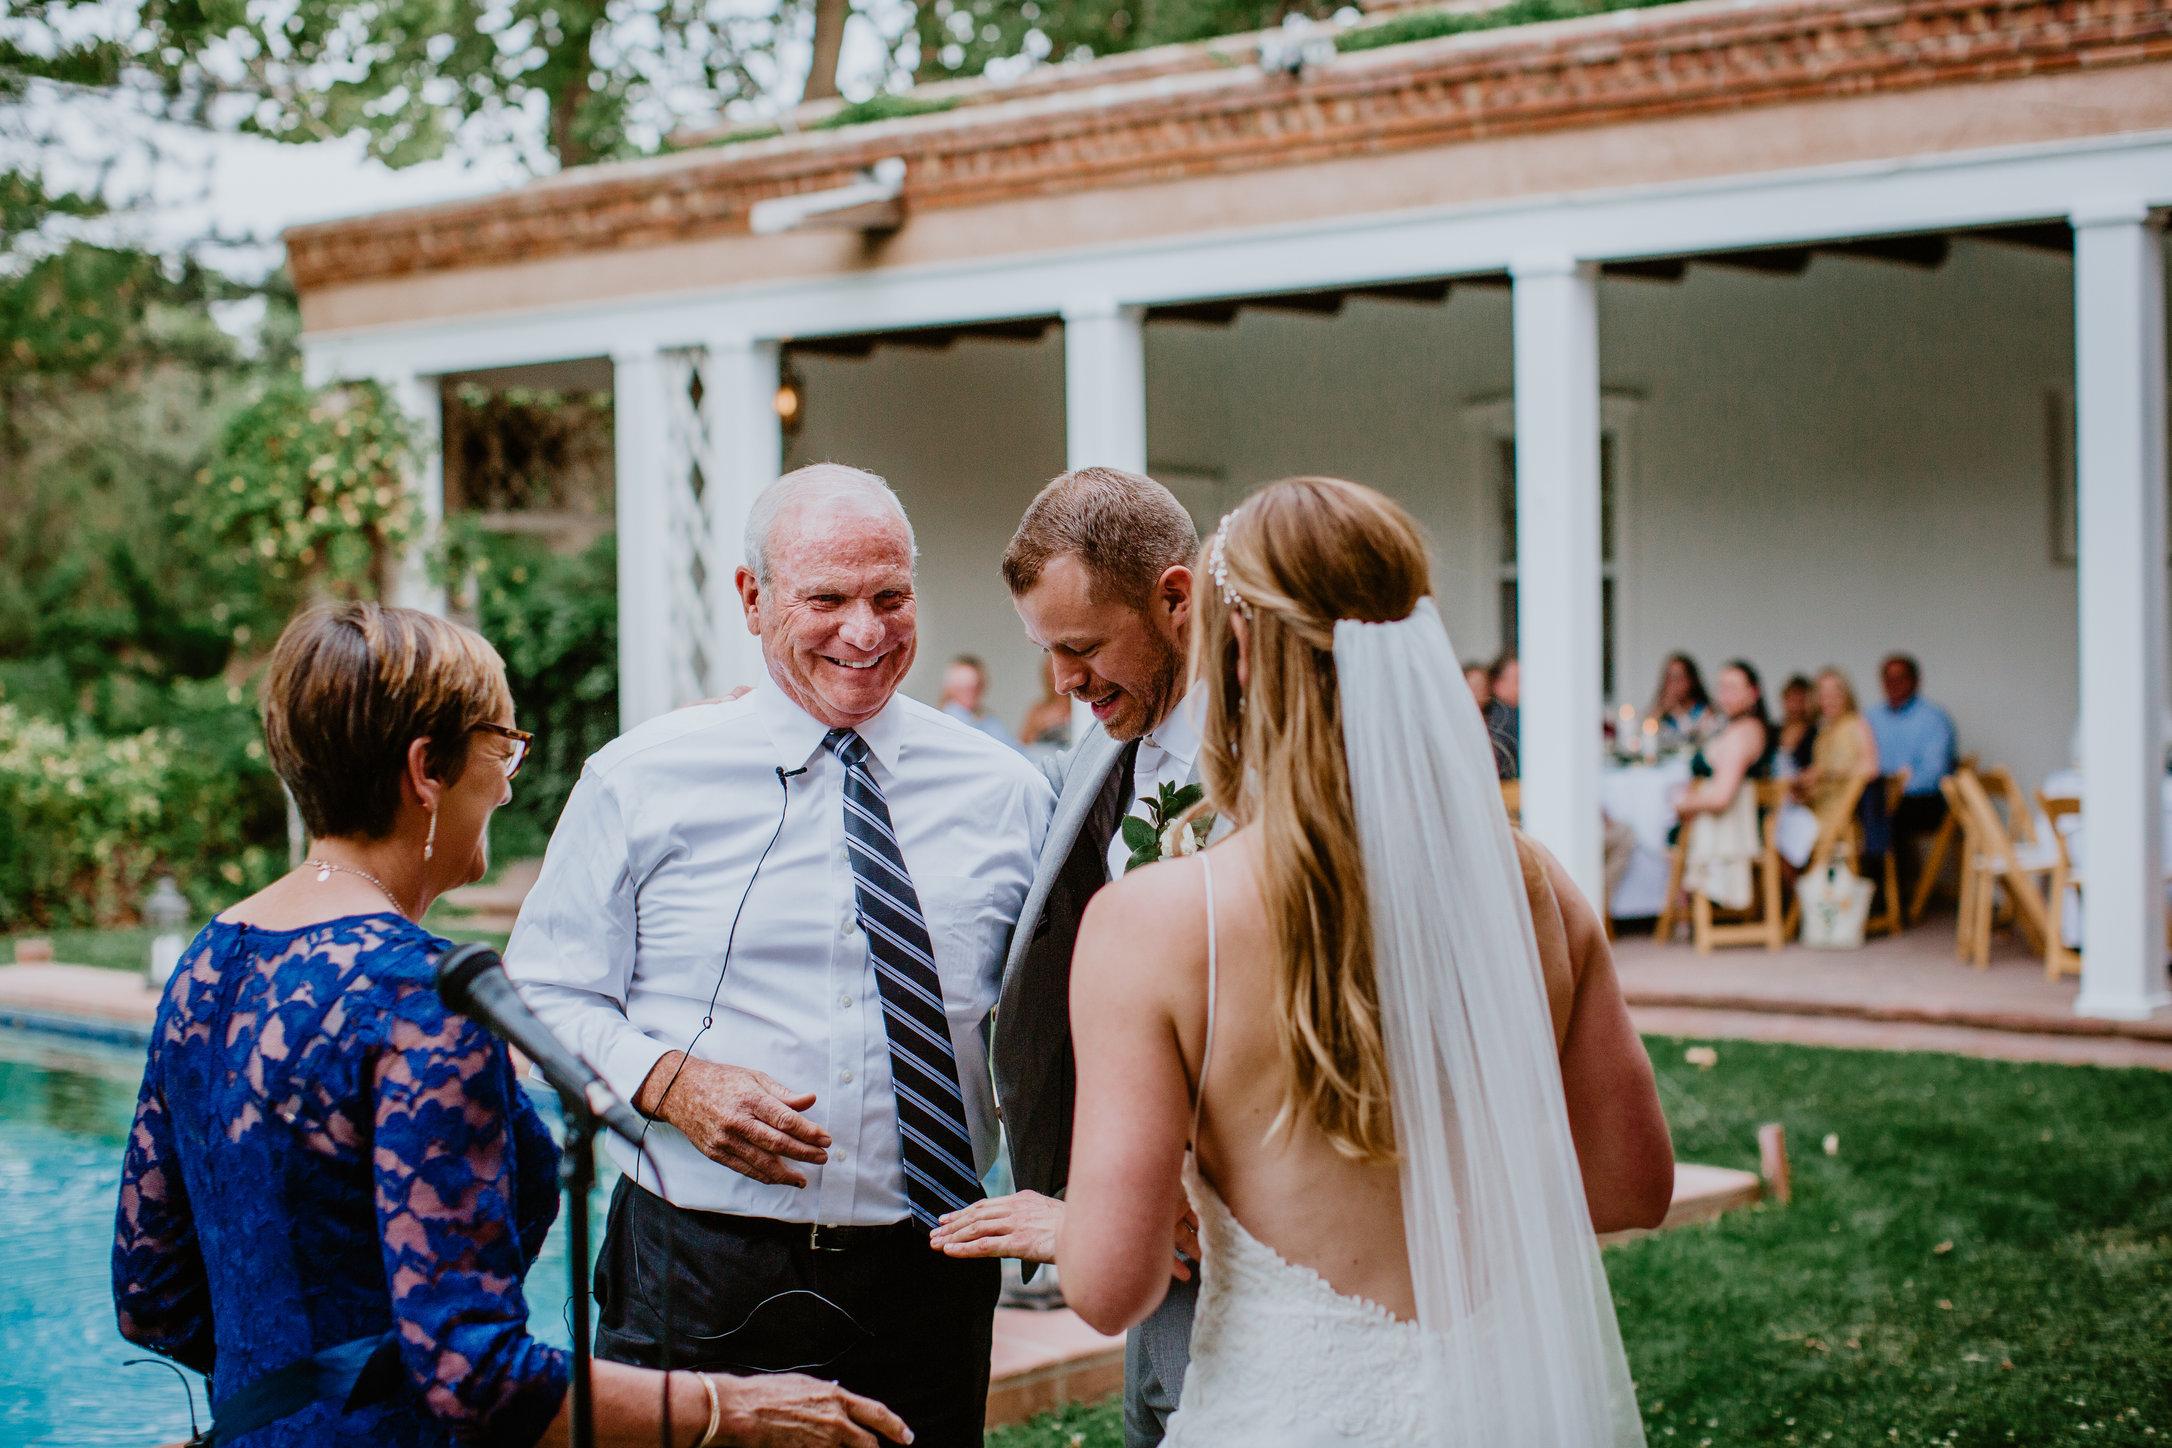 DandA-wedding-625.jpg